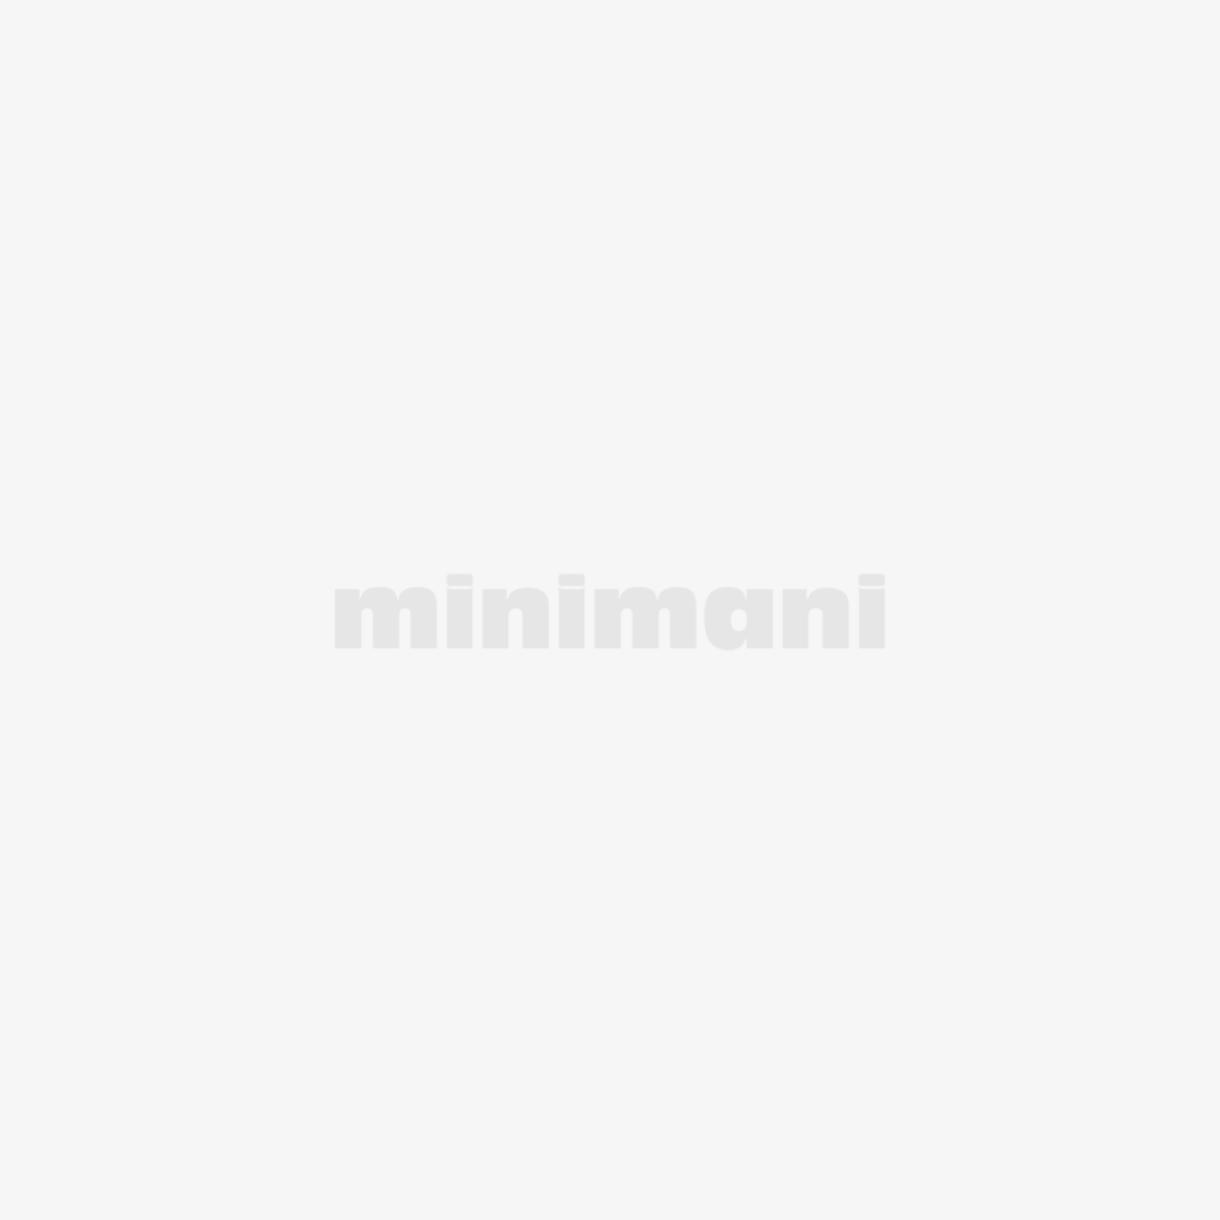 PLASTIC PADDING PATTEX PL300 LIIMATIIVISTEMASSA MUSTA 300 ML 300